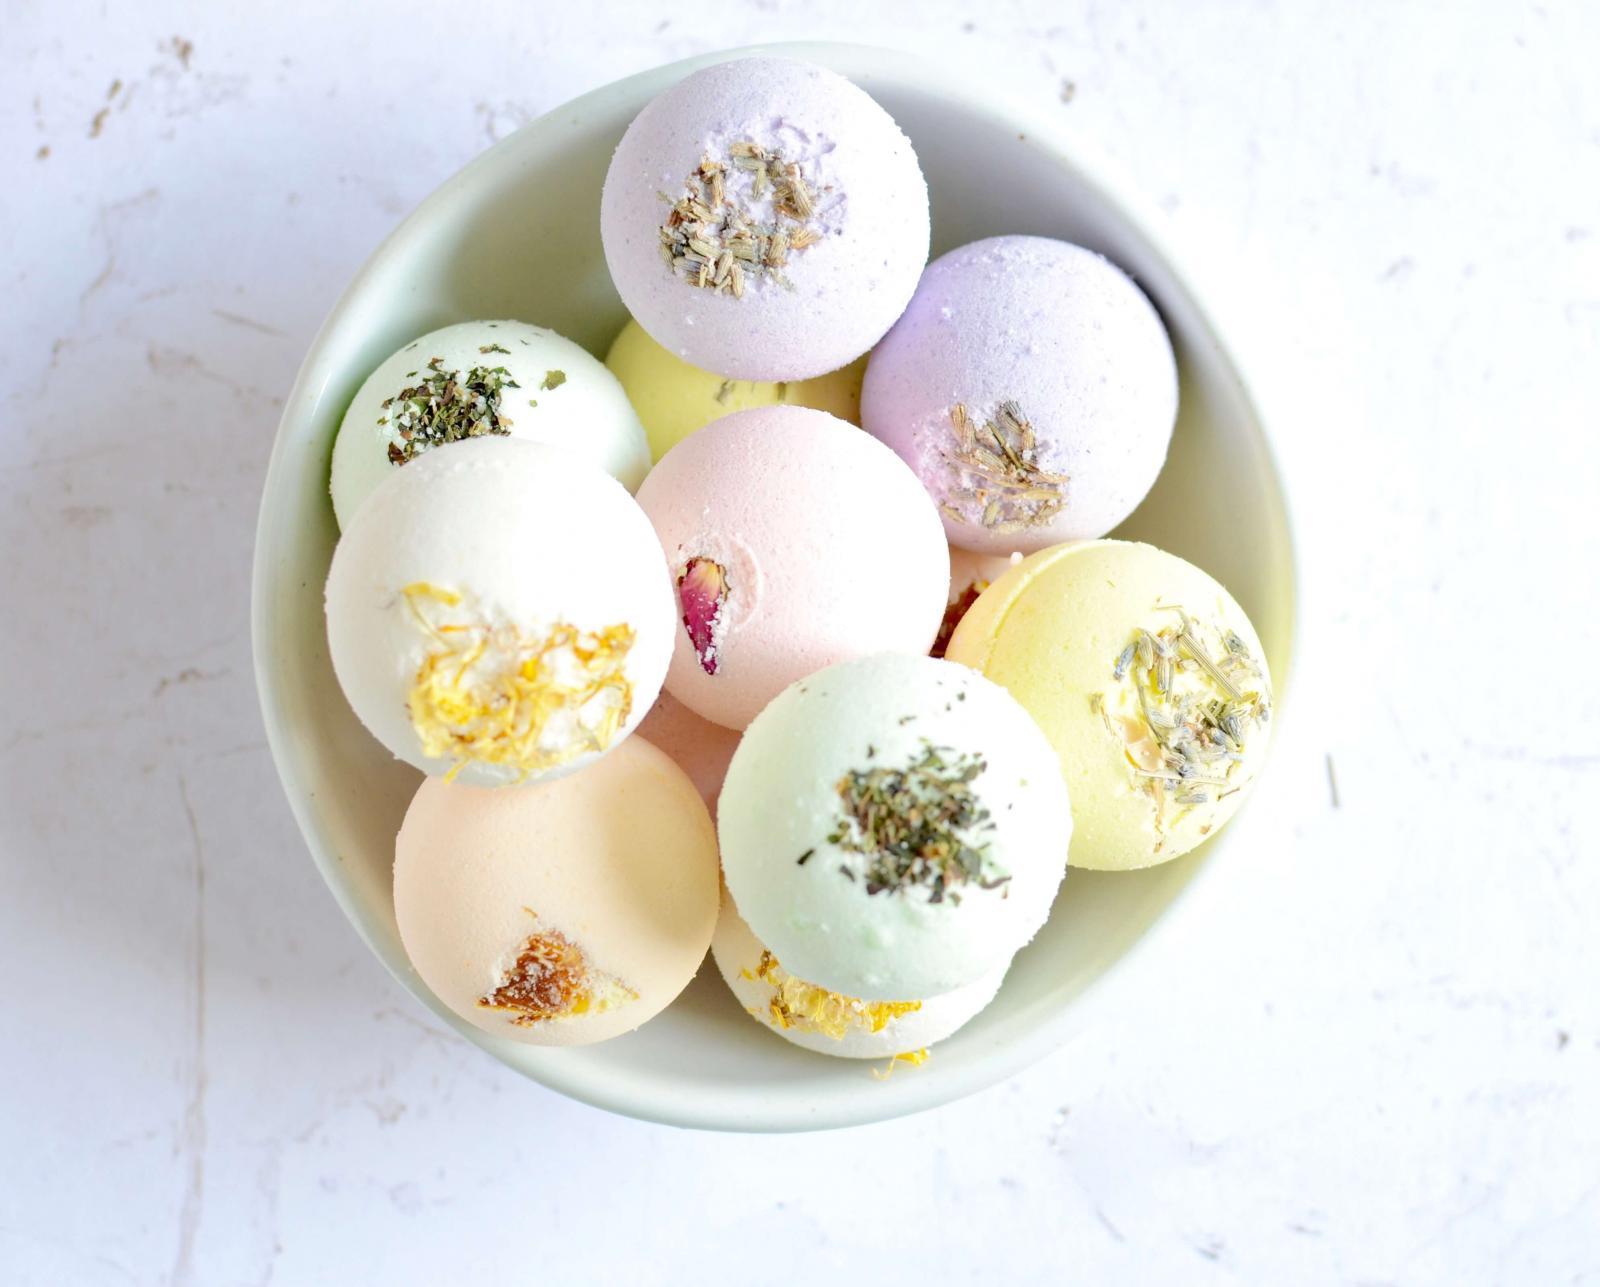 24 Mini Bath Bombs - Holiday Gifts - Bridal Shower Favors - Stocking Stuffers